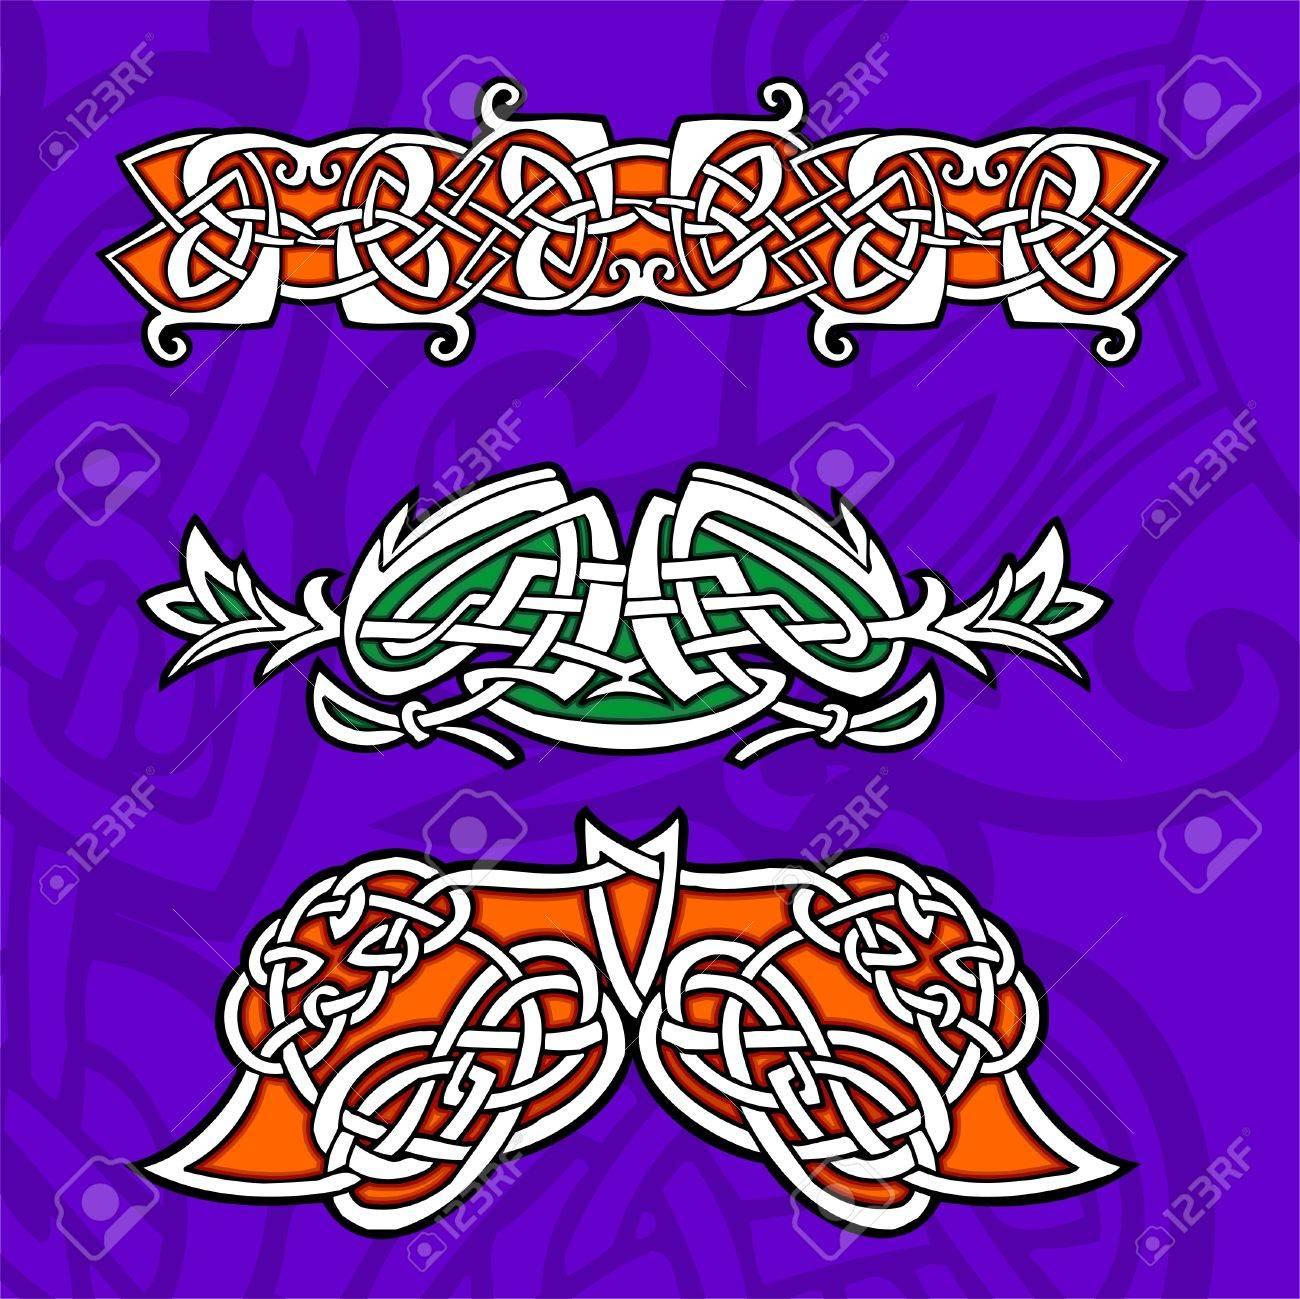 Celtic ornamental design  Illustration. Vinyl-Ready. Stock Vector - 8268887